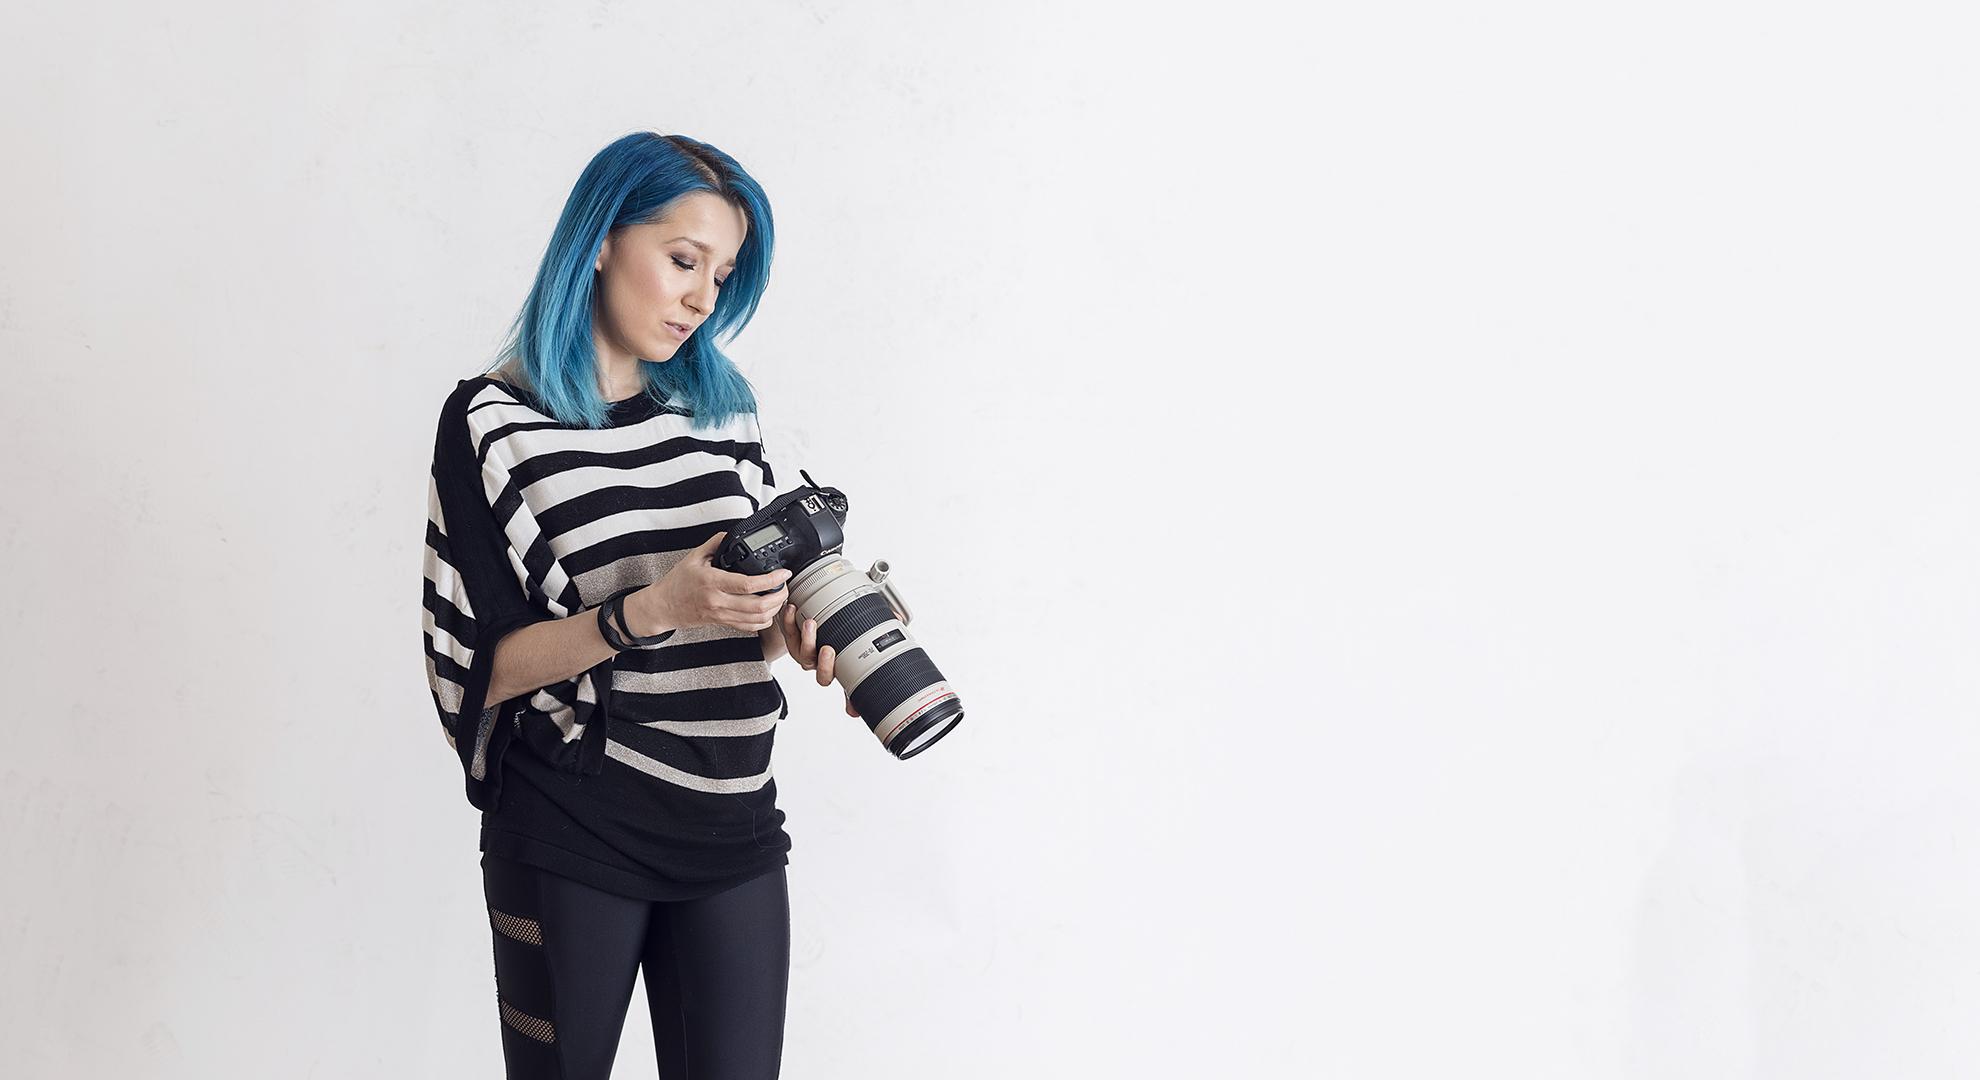 Hi, I'm Tora!   I'm a photographer and makeup artist from Montreal.